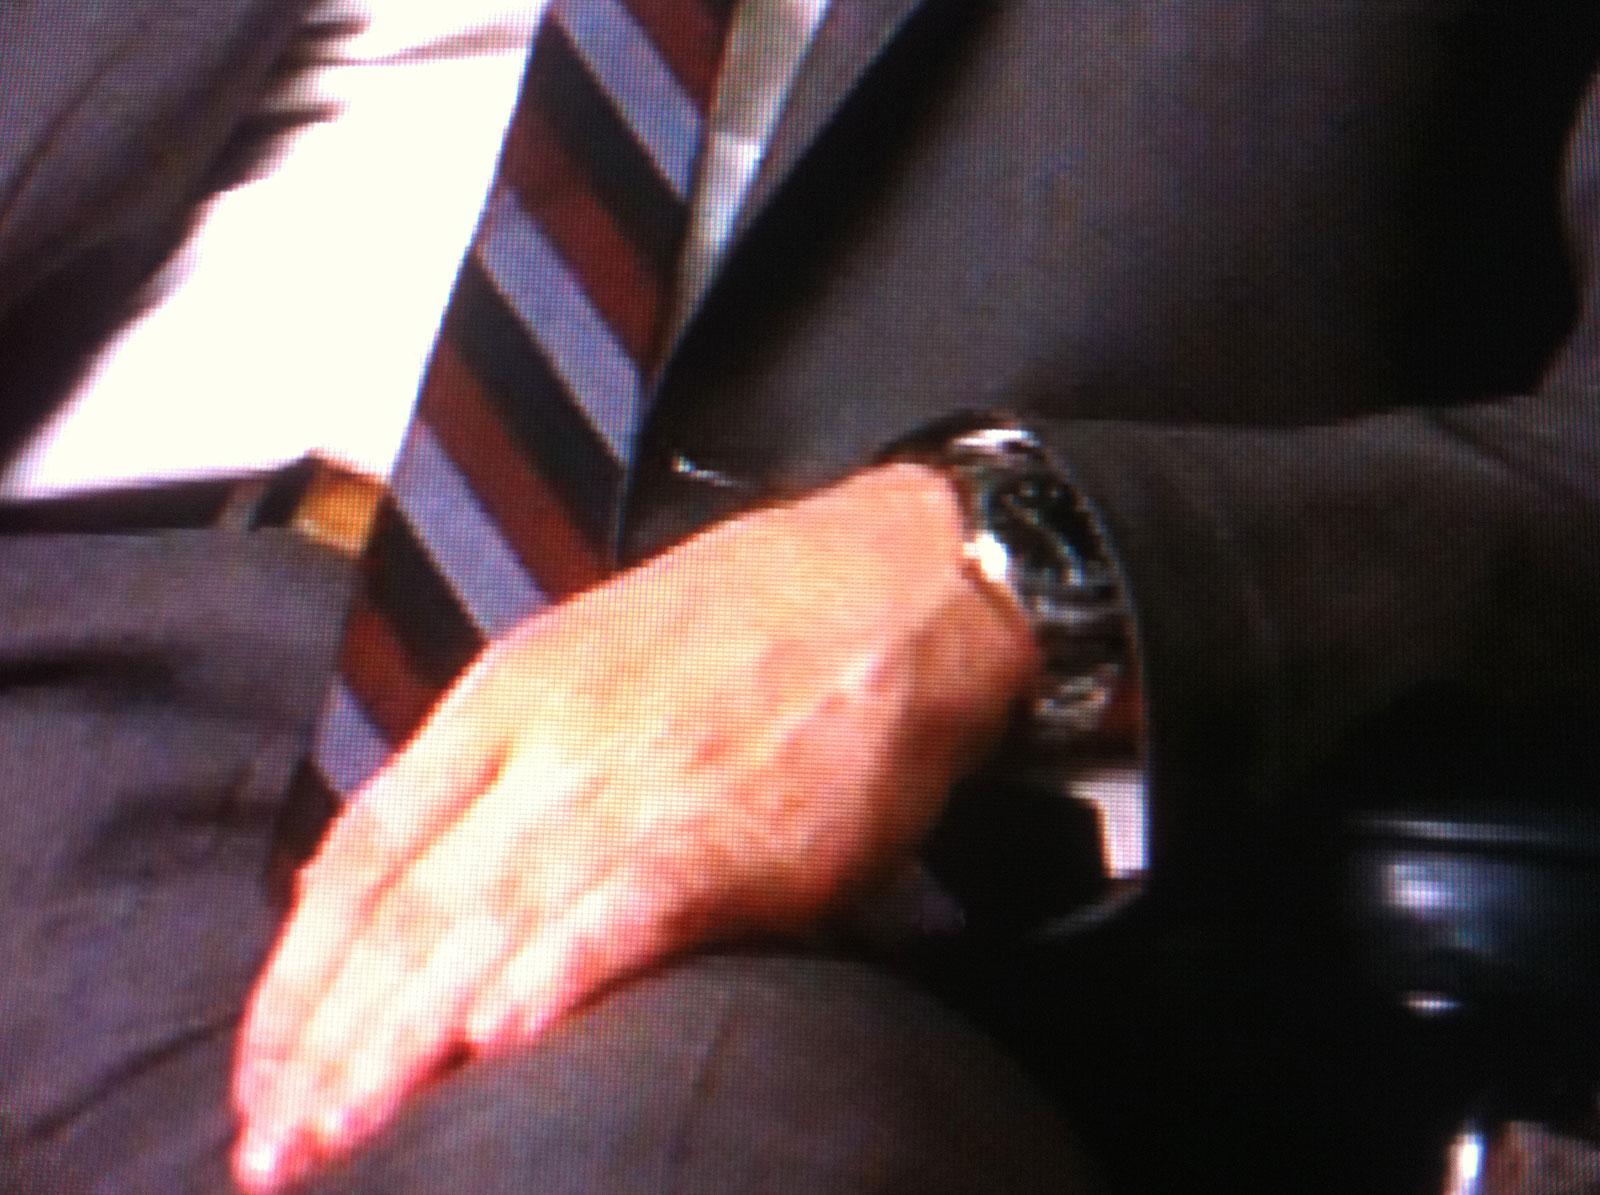 Rolex Super-Coolness: Jon Hamm MAD MEN Rolex